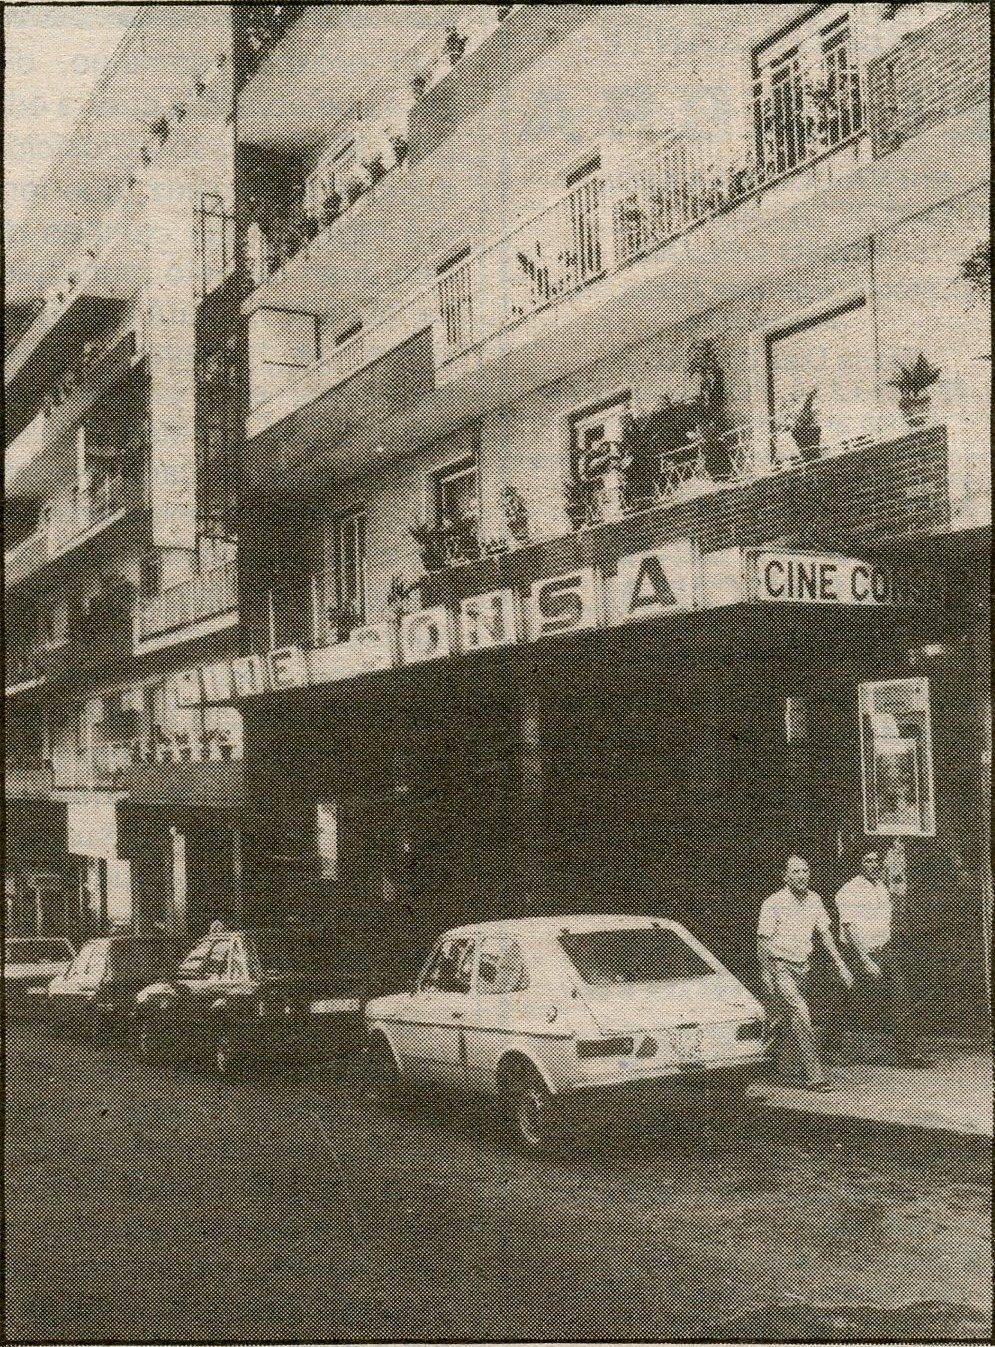 Cine Consa-2